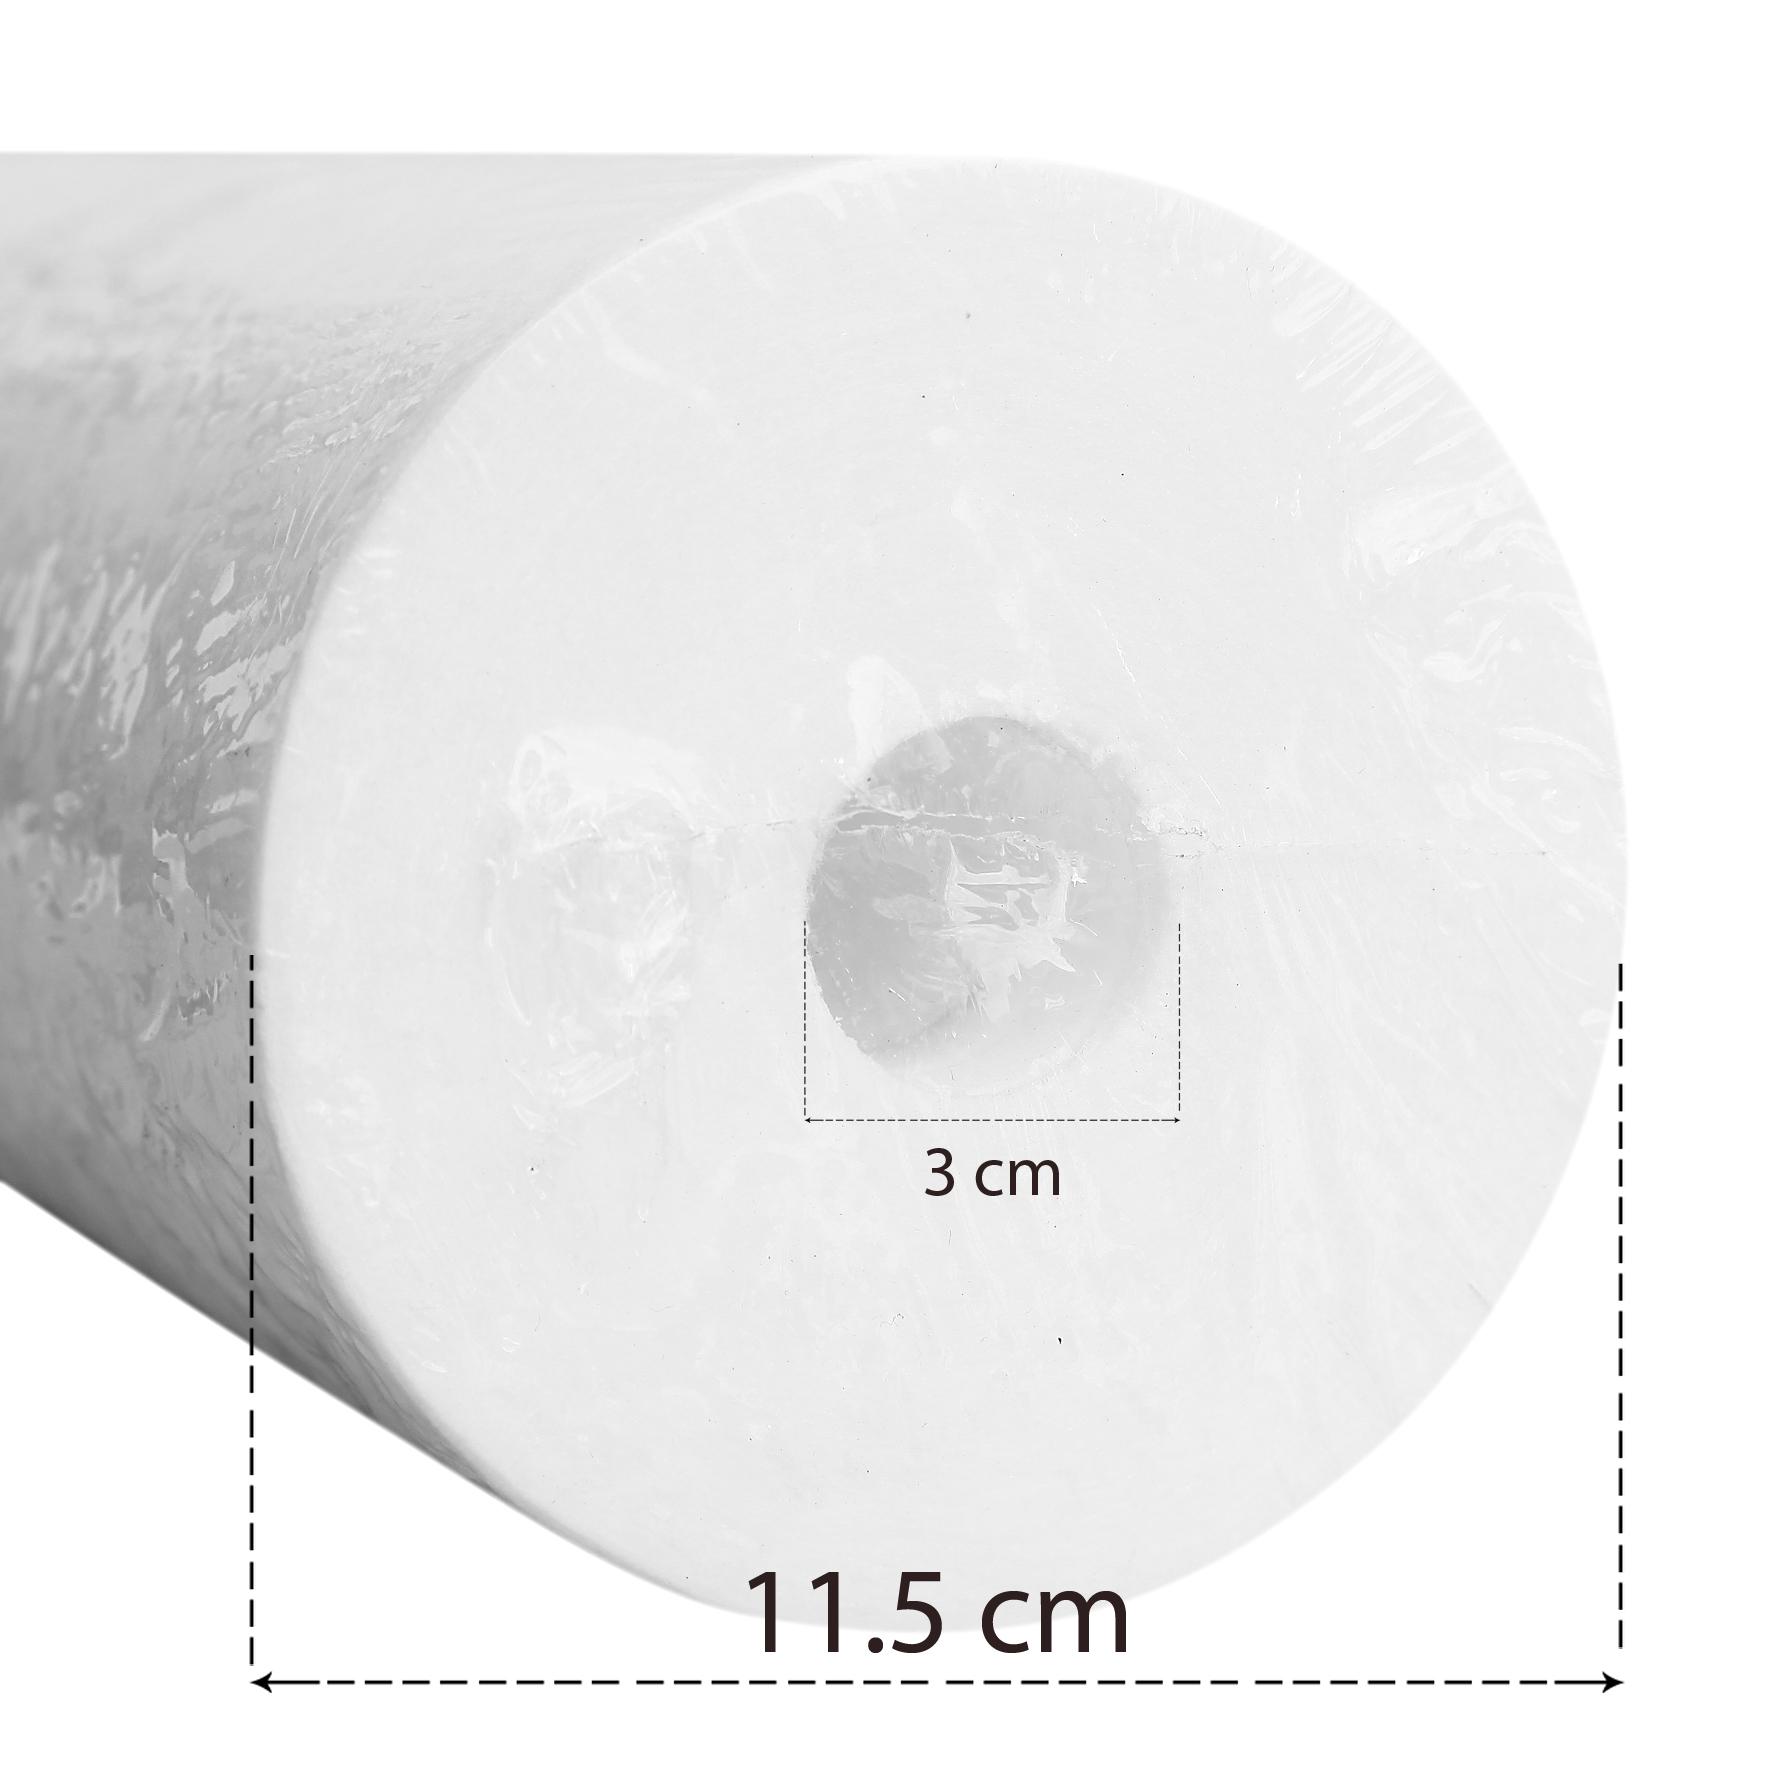 Lõi lọc thô PP BigBlue 5mic – 20 inch Béo